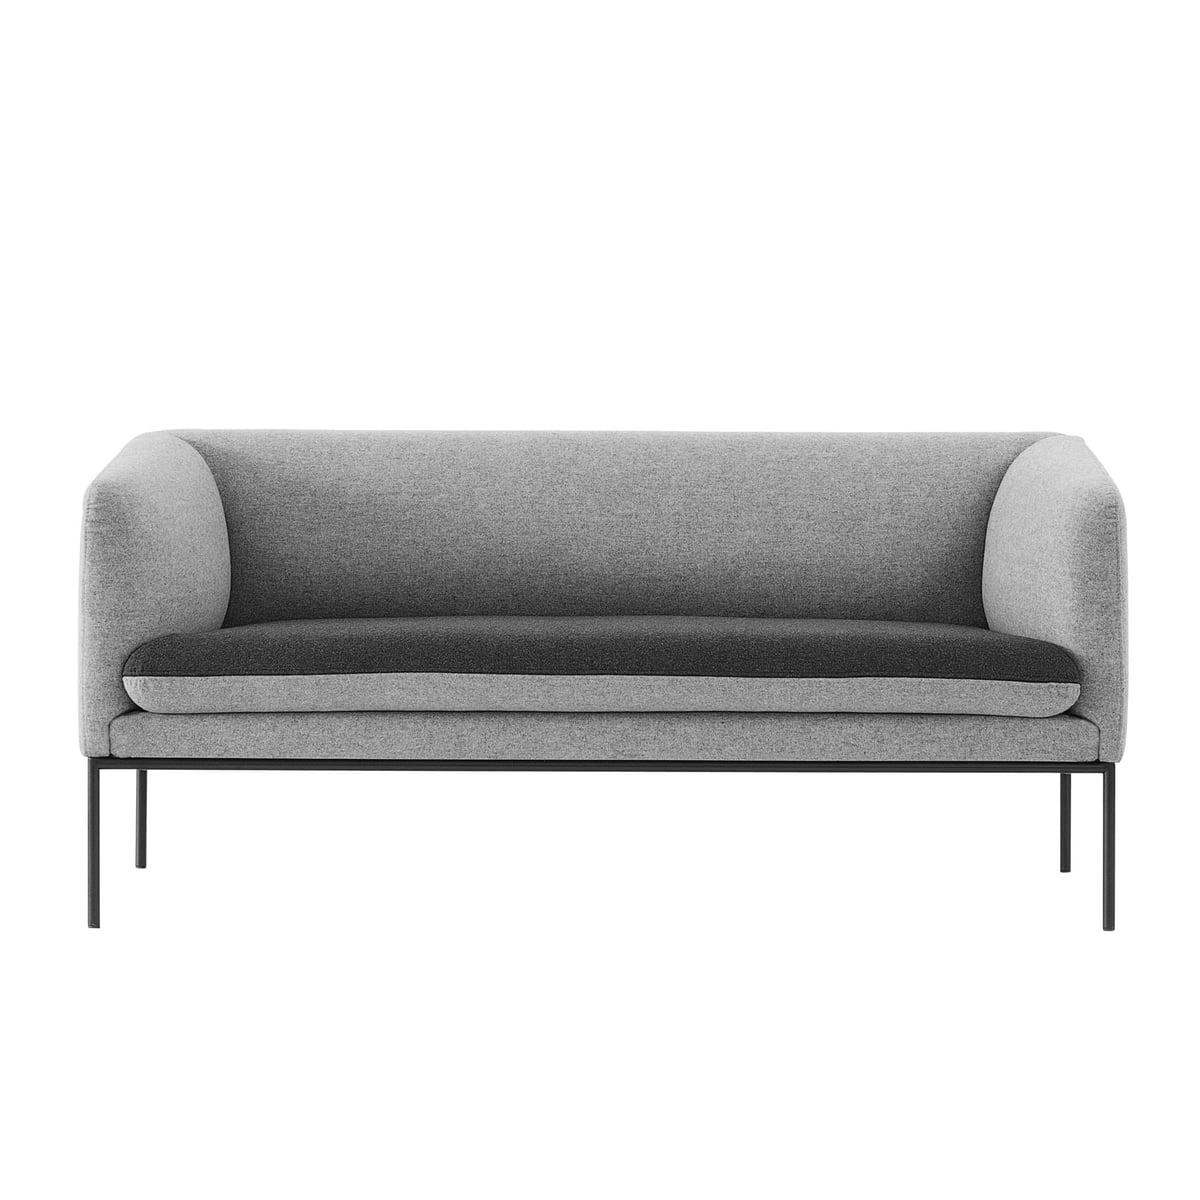 Fesselnd Turn Sofa (2 Sitzer) Von Ferm Living In Baumwolle Dunkelgrau / Hellgrau